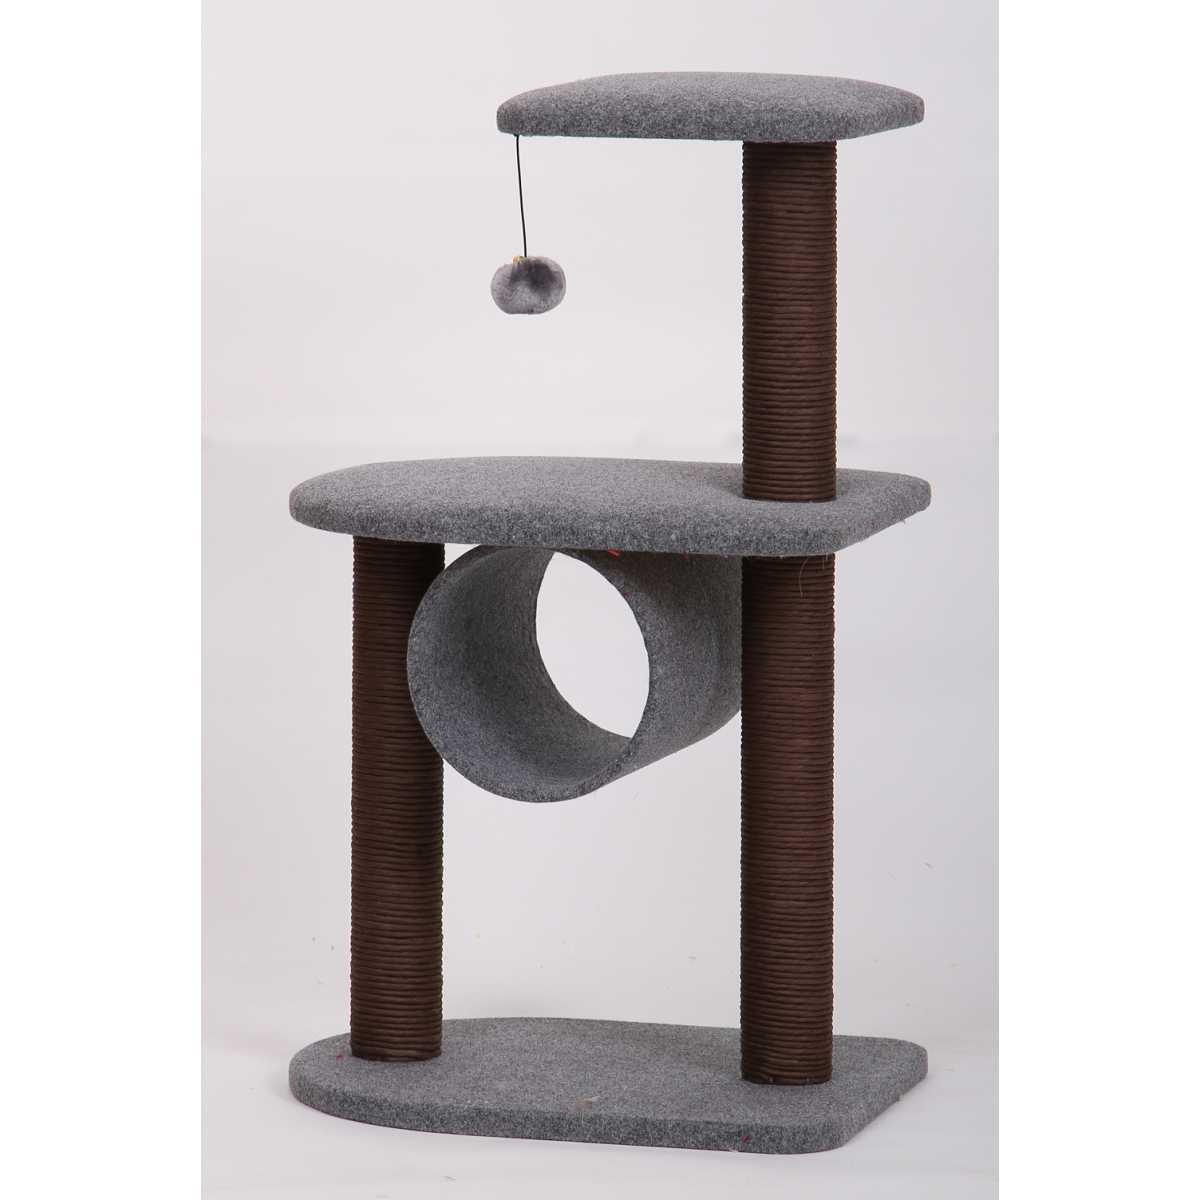 5095202c1044 Teeny Cat Tree and Scratcher - CatsPlay Superstore